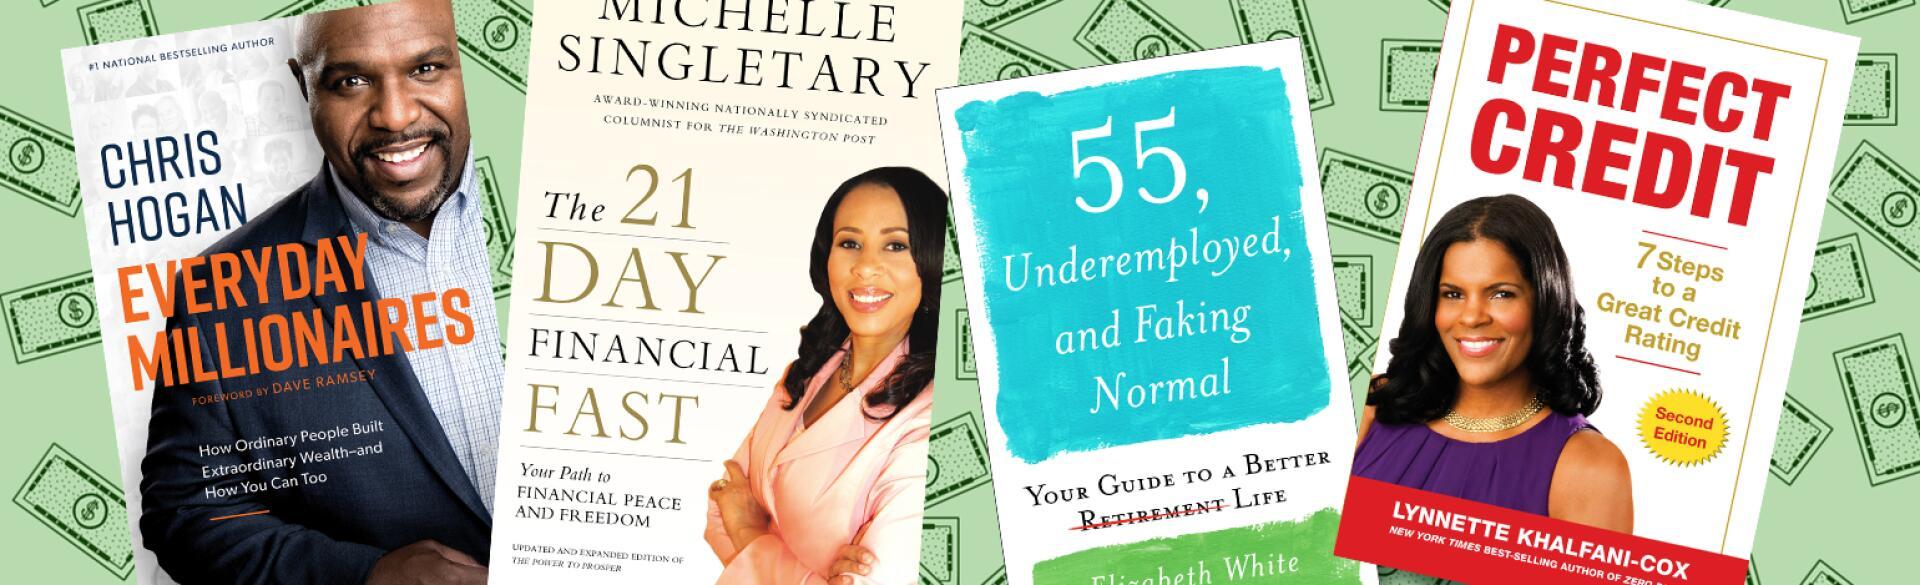 Money Books, credit, aarp, sisters, money